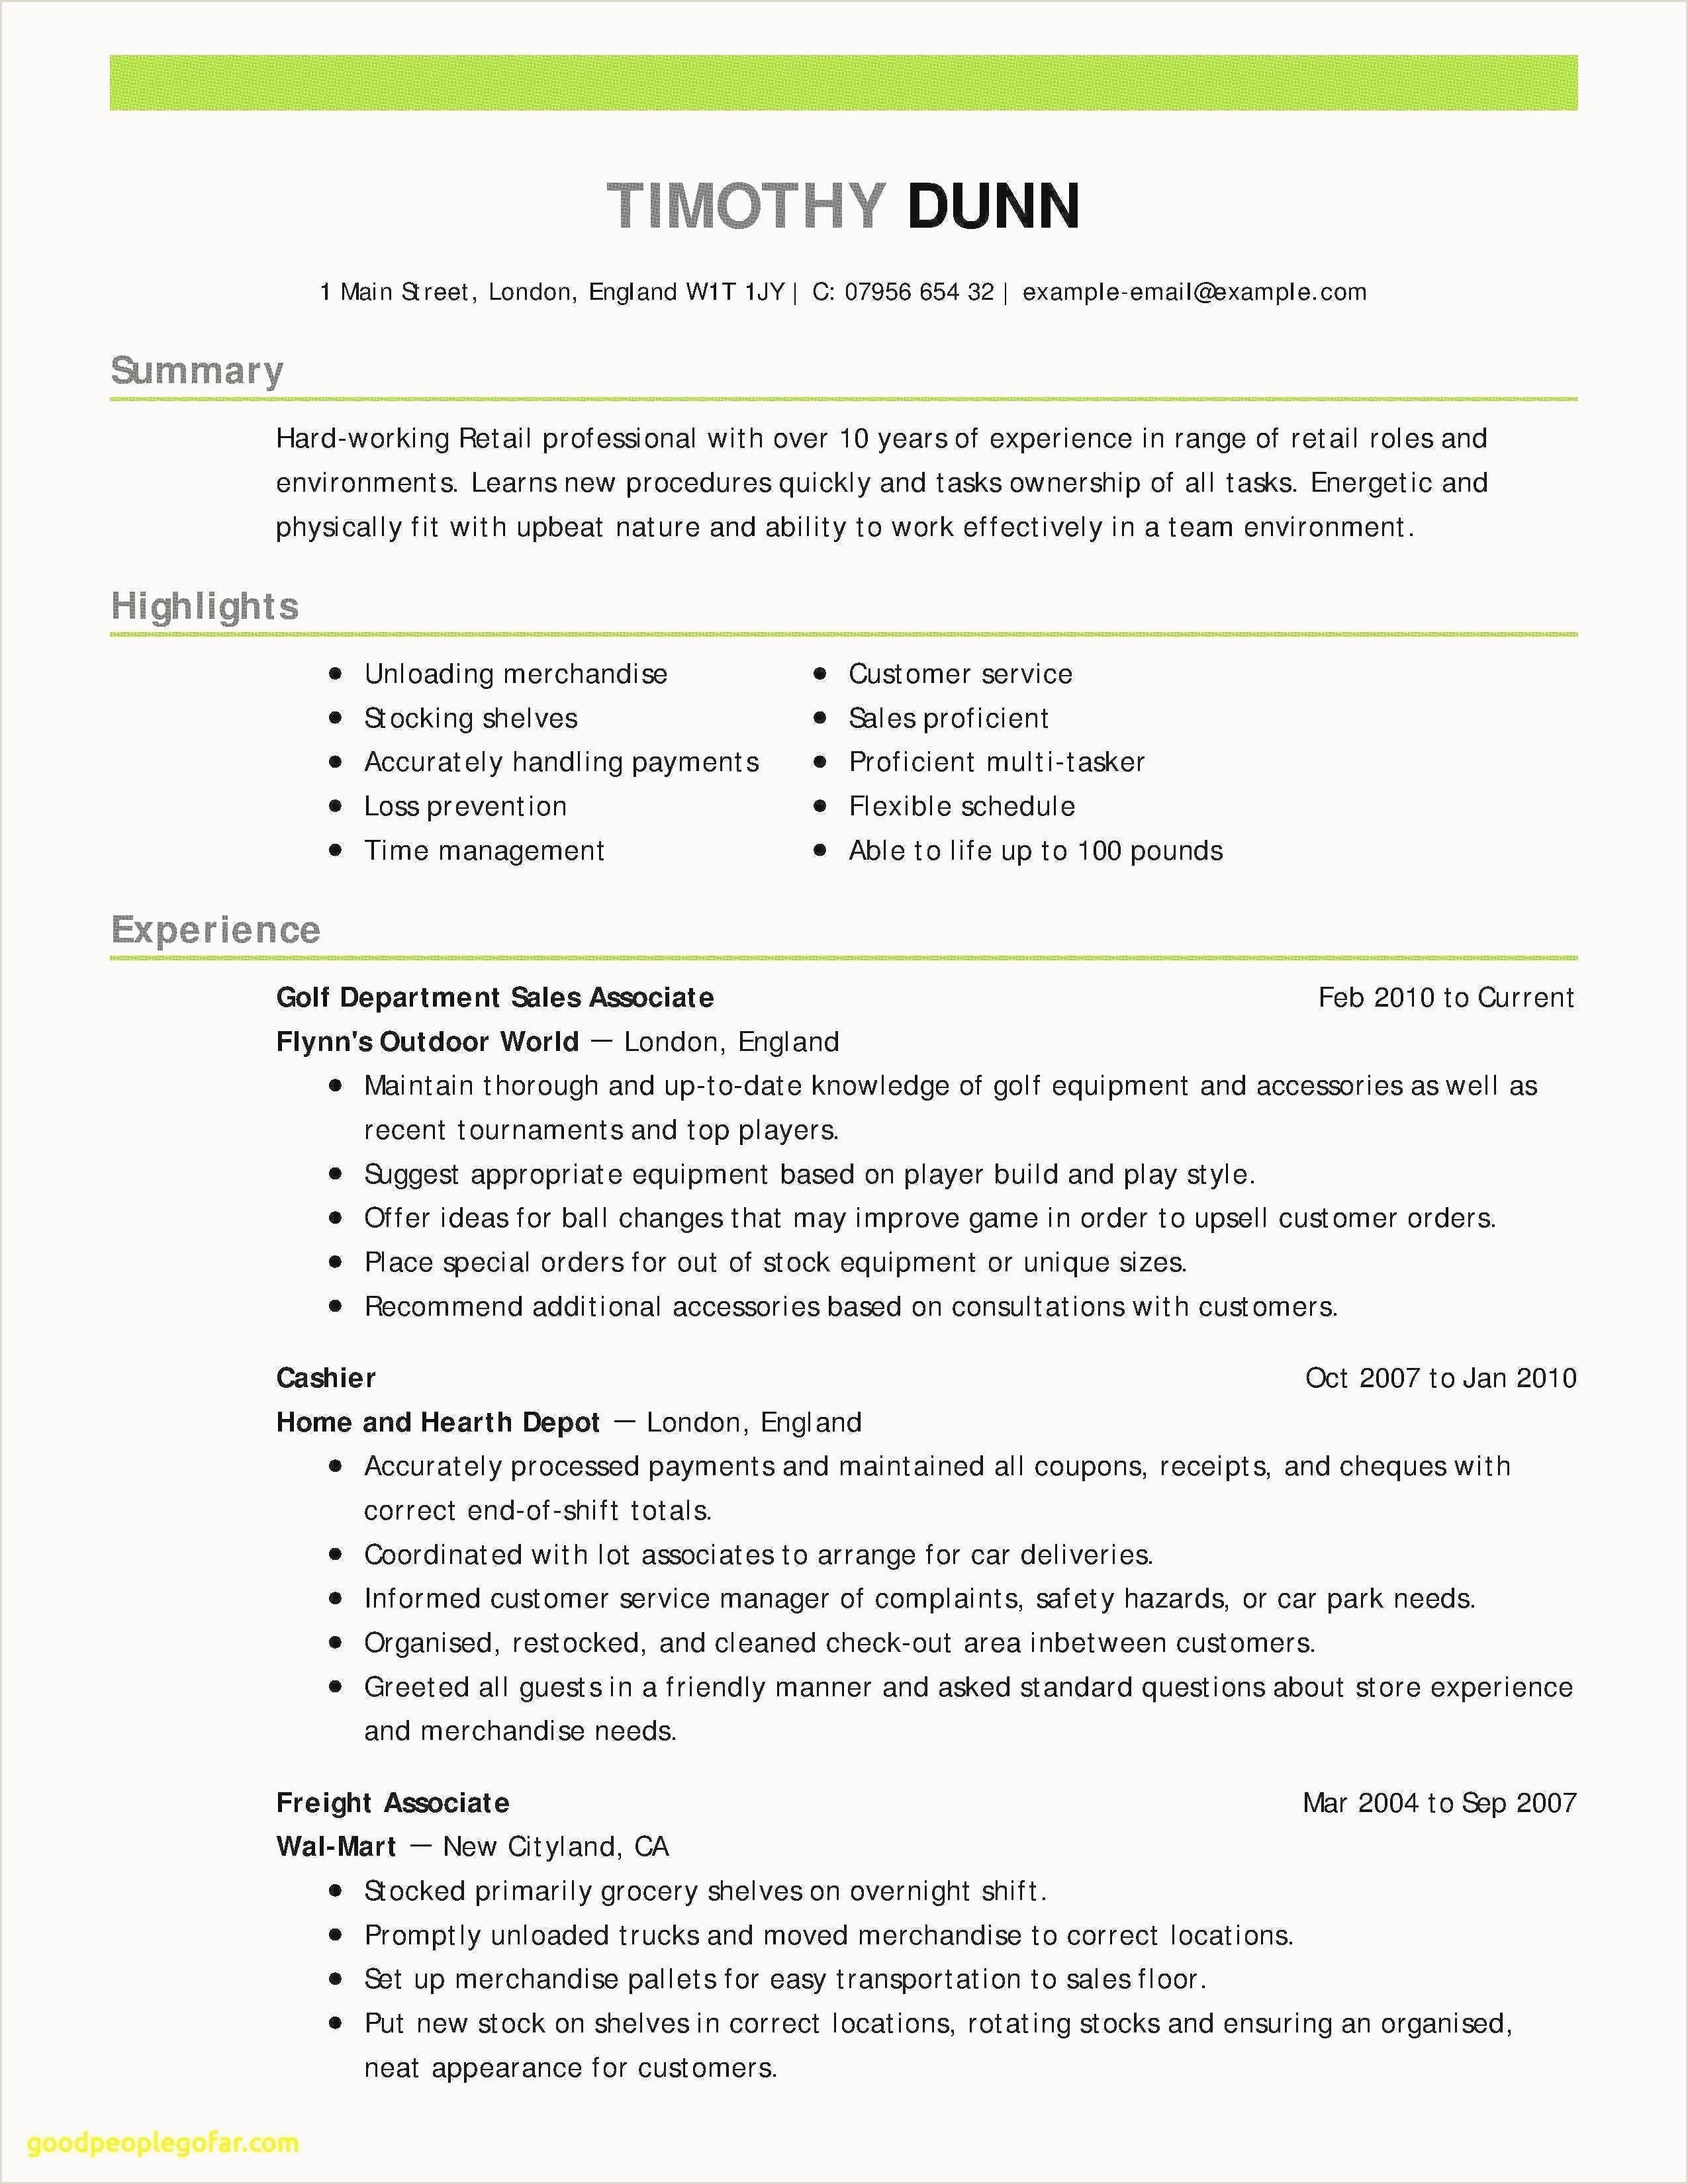 Curriculum Vitae Para Rellenar formato De Diplomas Para Llenar